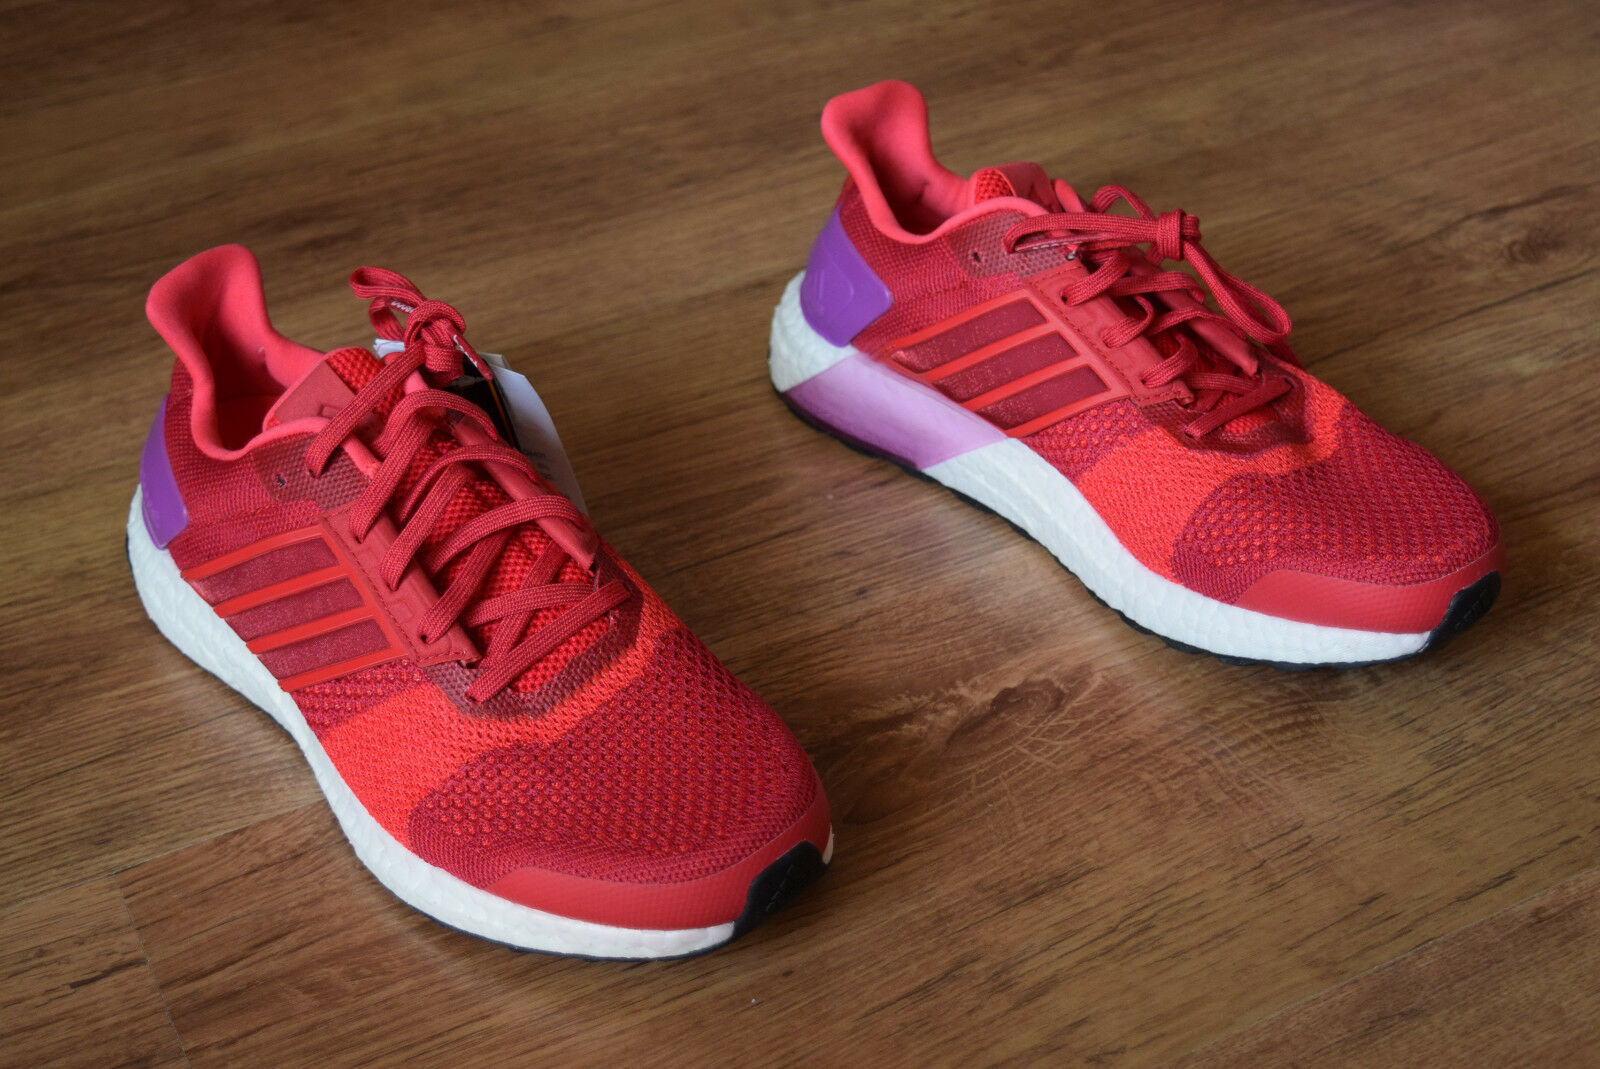 Adidas Ultra Boost Boost Boost ST w  36,5 39 40  Laufschuhe AQ4431 cOnSorTium nmd r1 pure 06c410